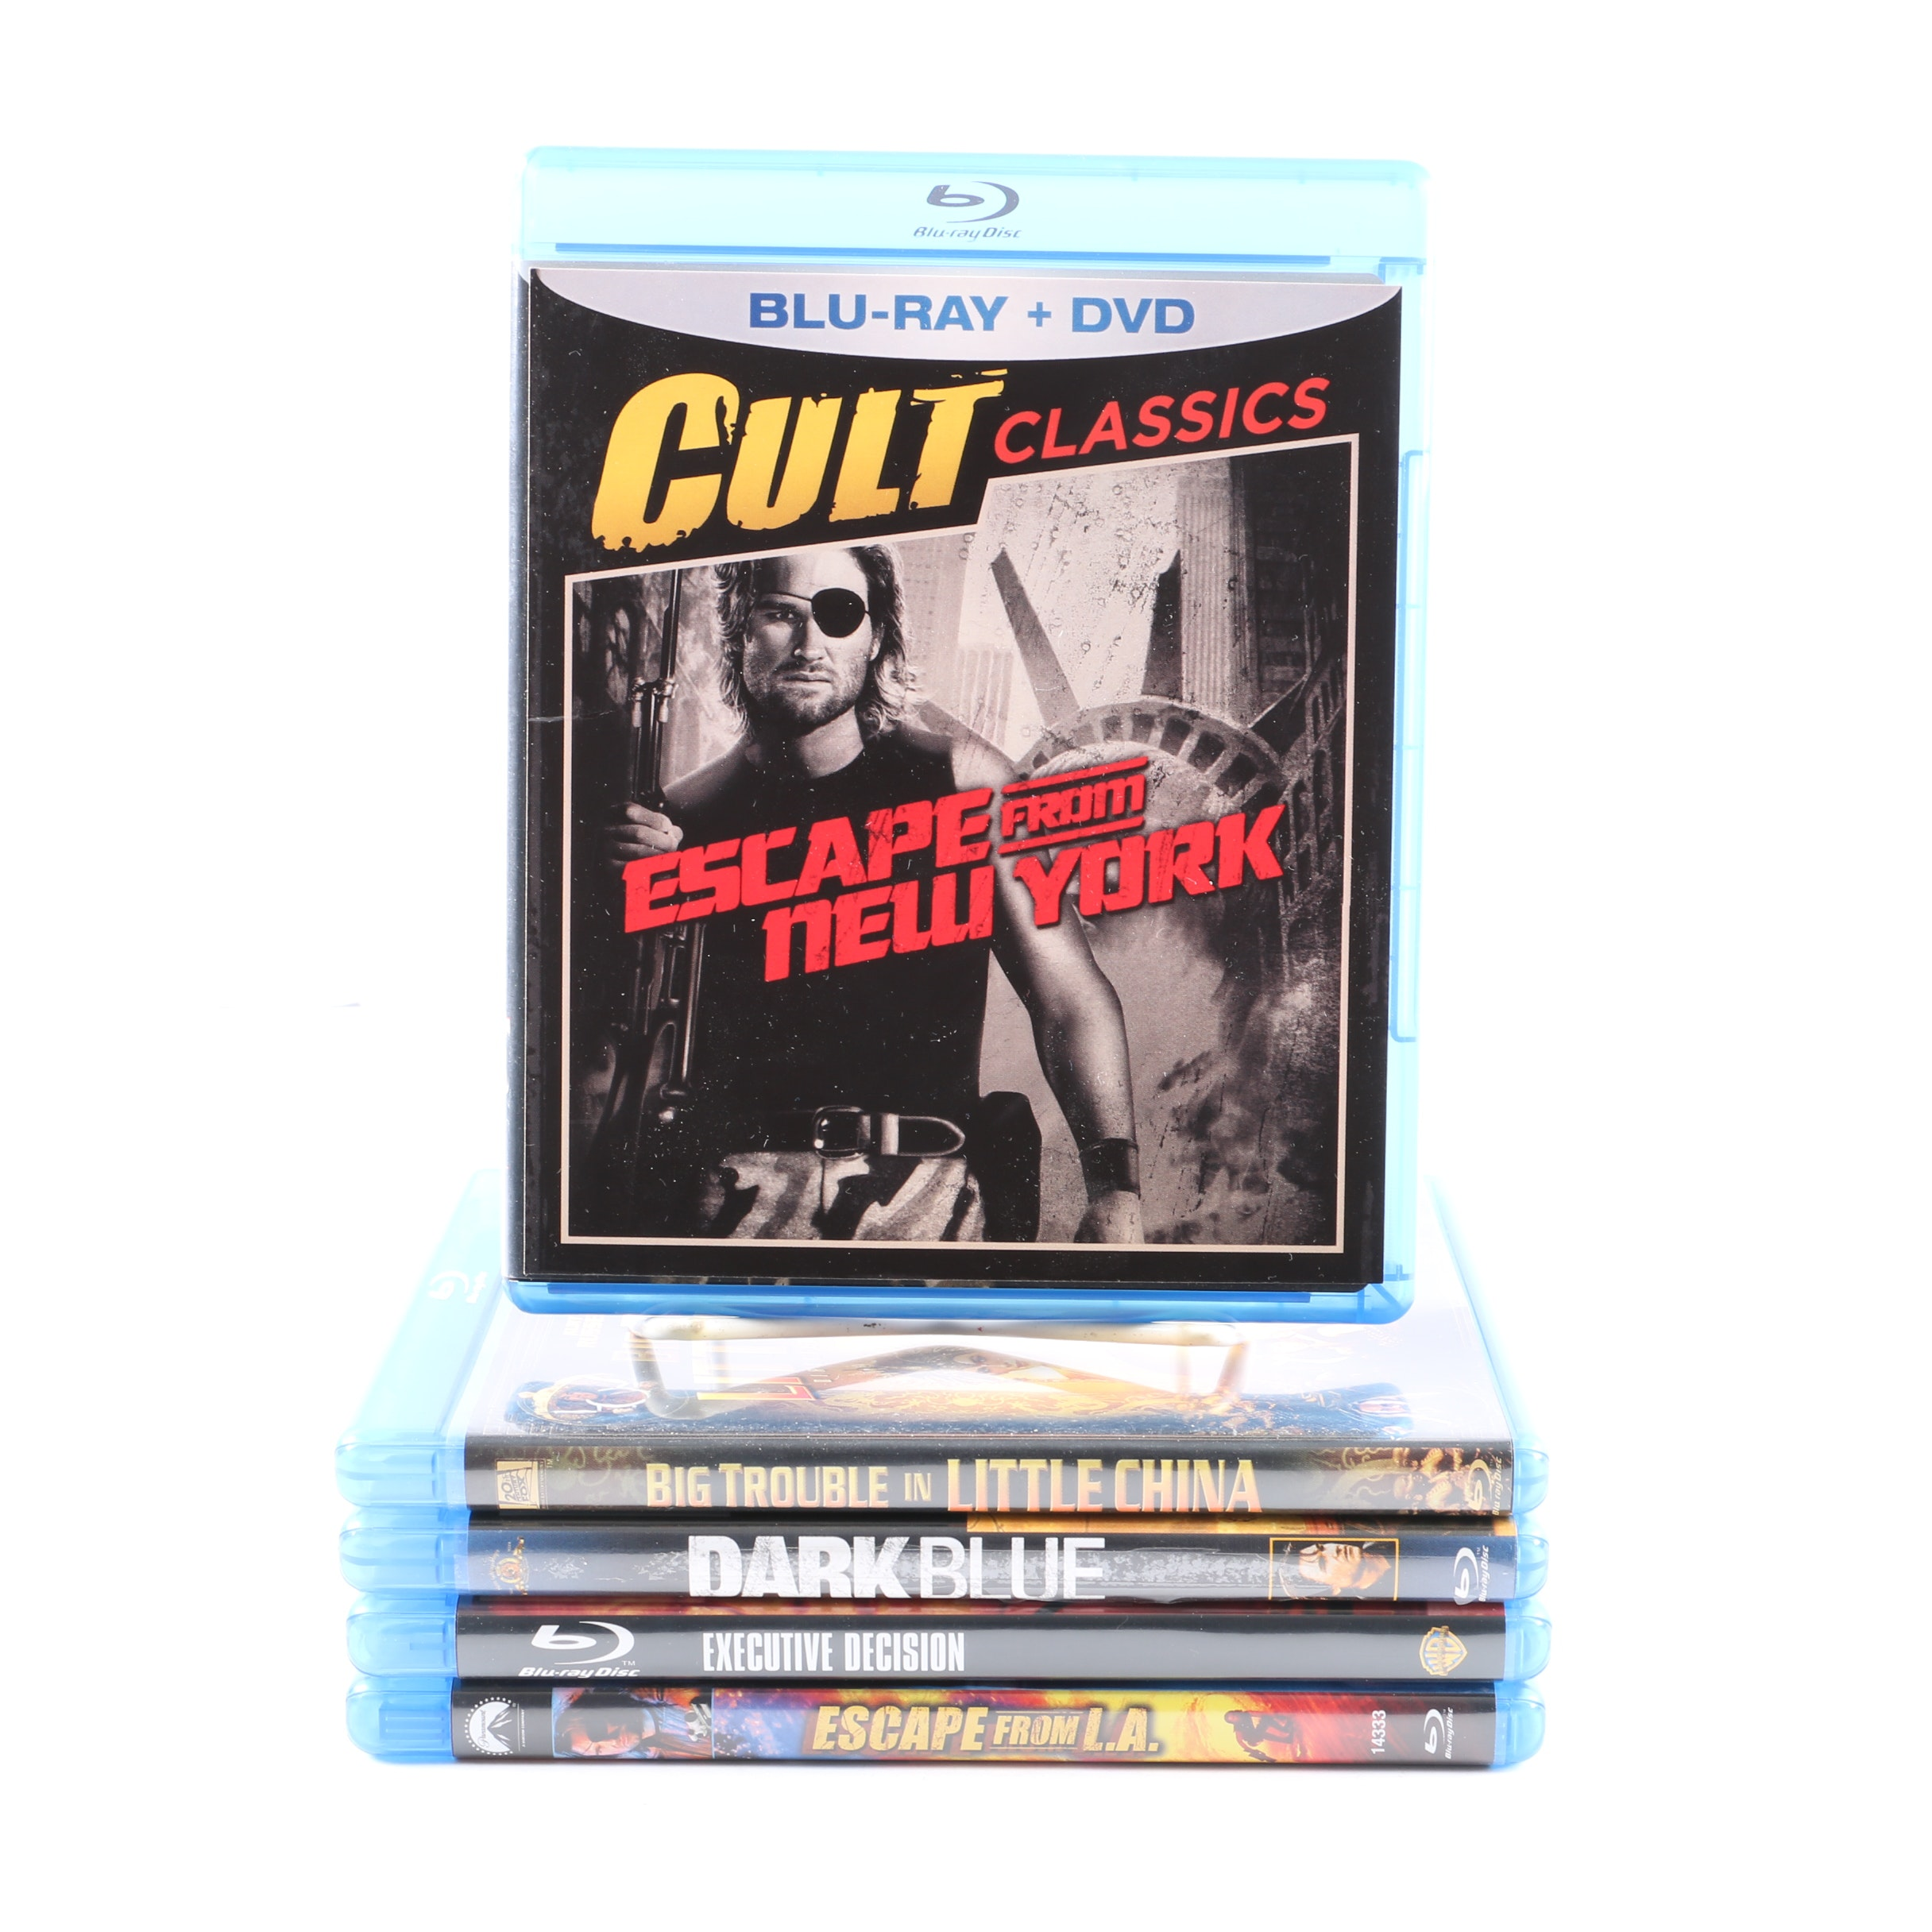 Kurt Russell Films On Blu-Ray